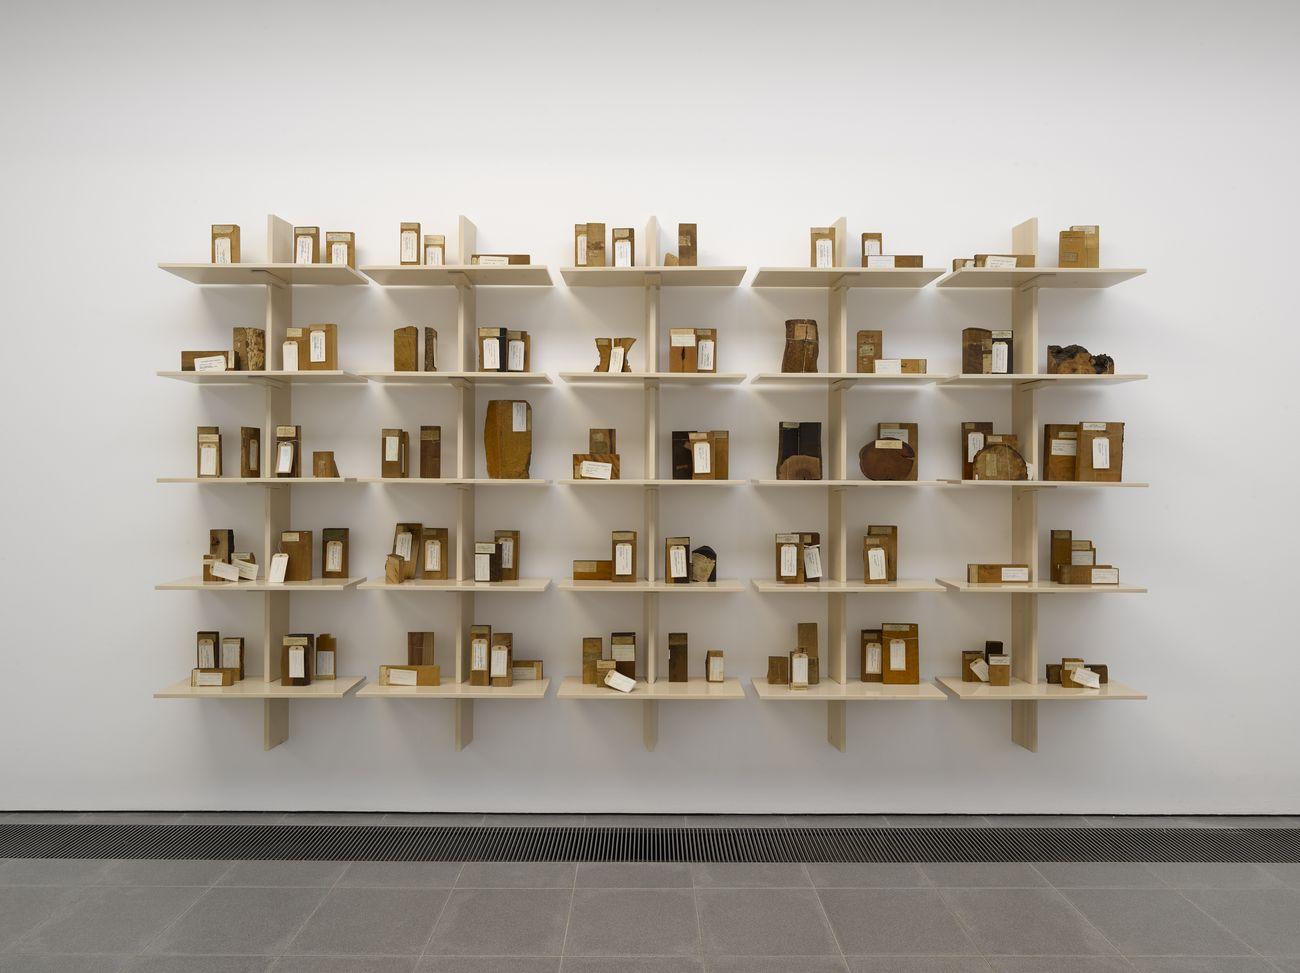 Formafantasma, Cambio, installation view at Serpentine Galleries, Londra 2020. Photo credit George Darrell